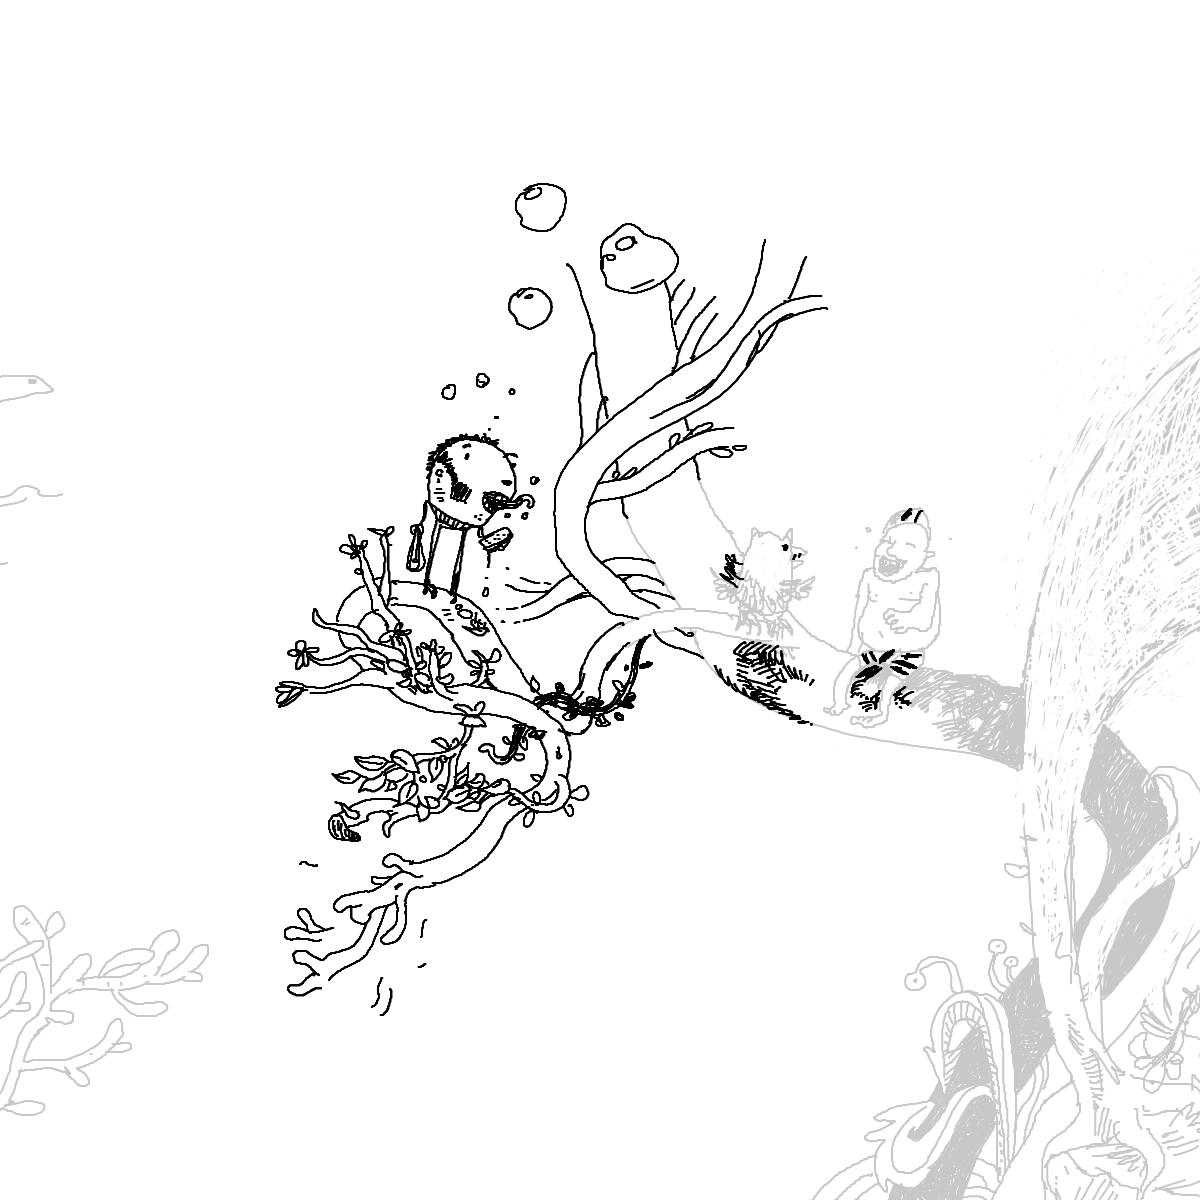 BAAAM drawing#4172 lat:78.4207687377929700lng: -4.4888601303100590